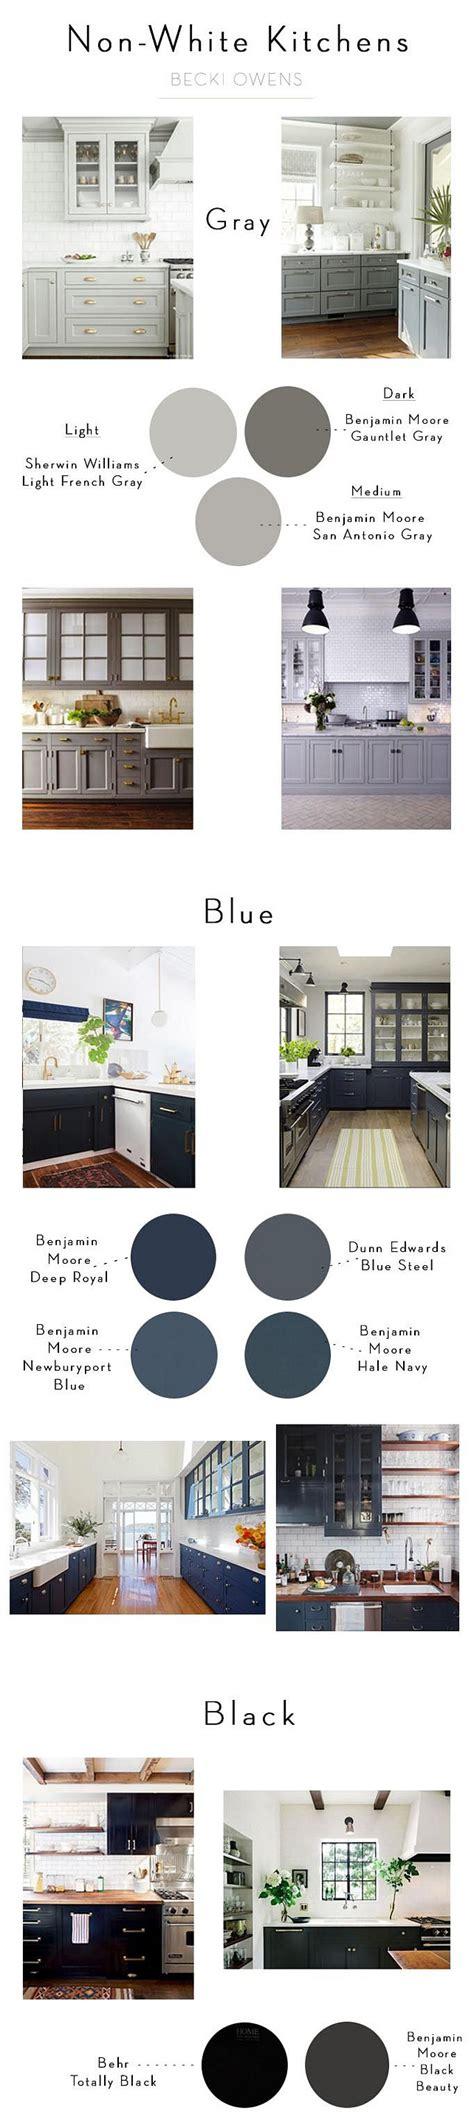 non white kitchen cabinet color diy pinterest interior design ideas home bunch interior design ideas